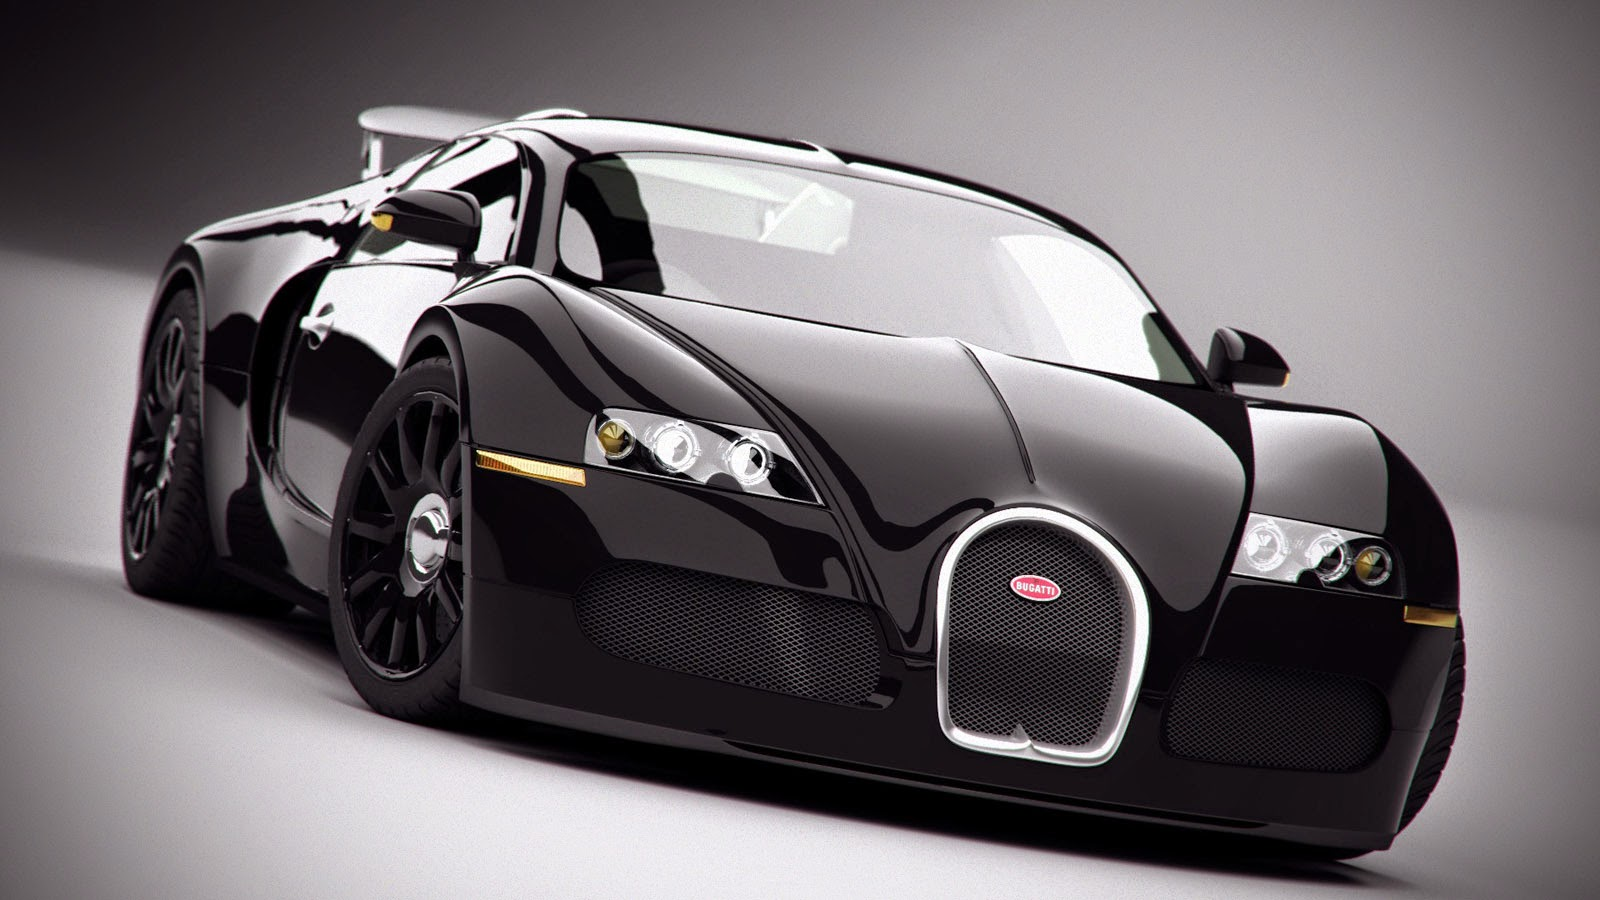 Bugatti Veyron Price 2015 >> New Car Design And Price 2015 Bugatti Veyron The Faster Car